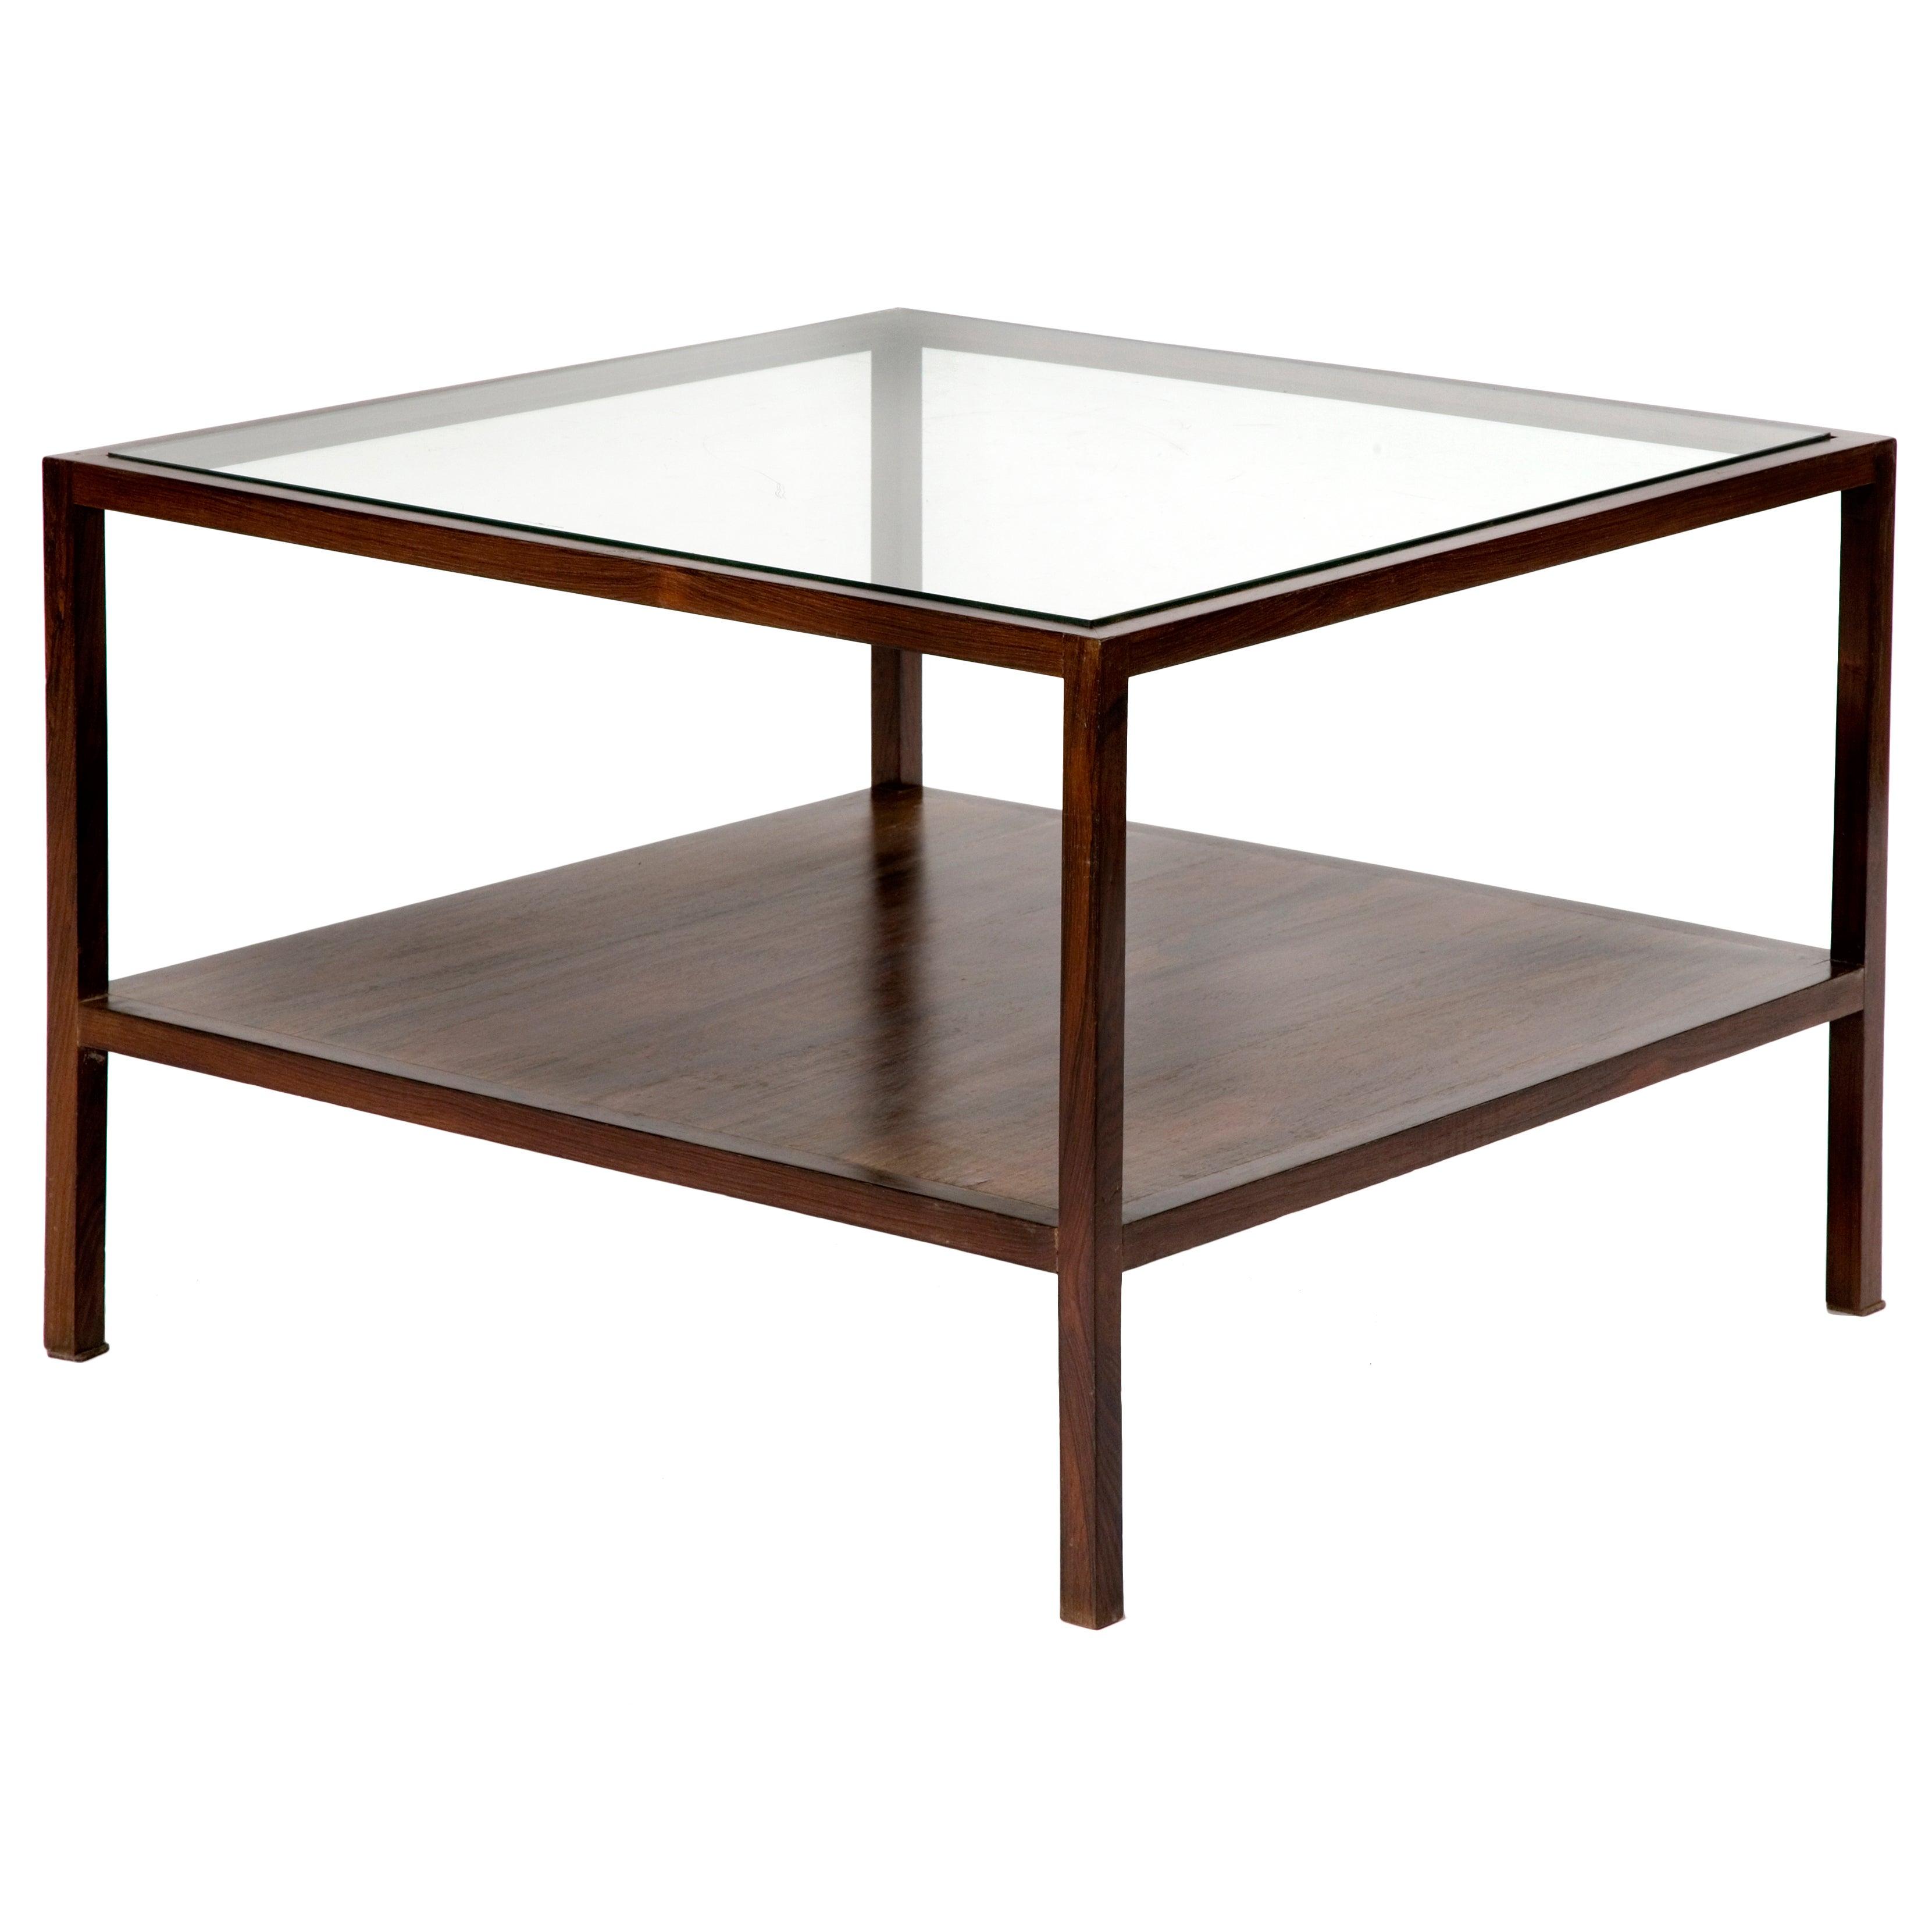 Square Coffee Table in Jacaranda with Glass Top by Joaquim Tenreiro, 1954